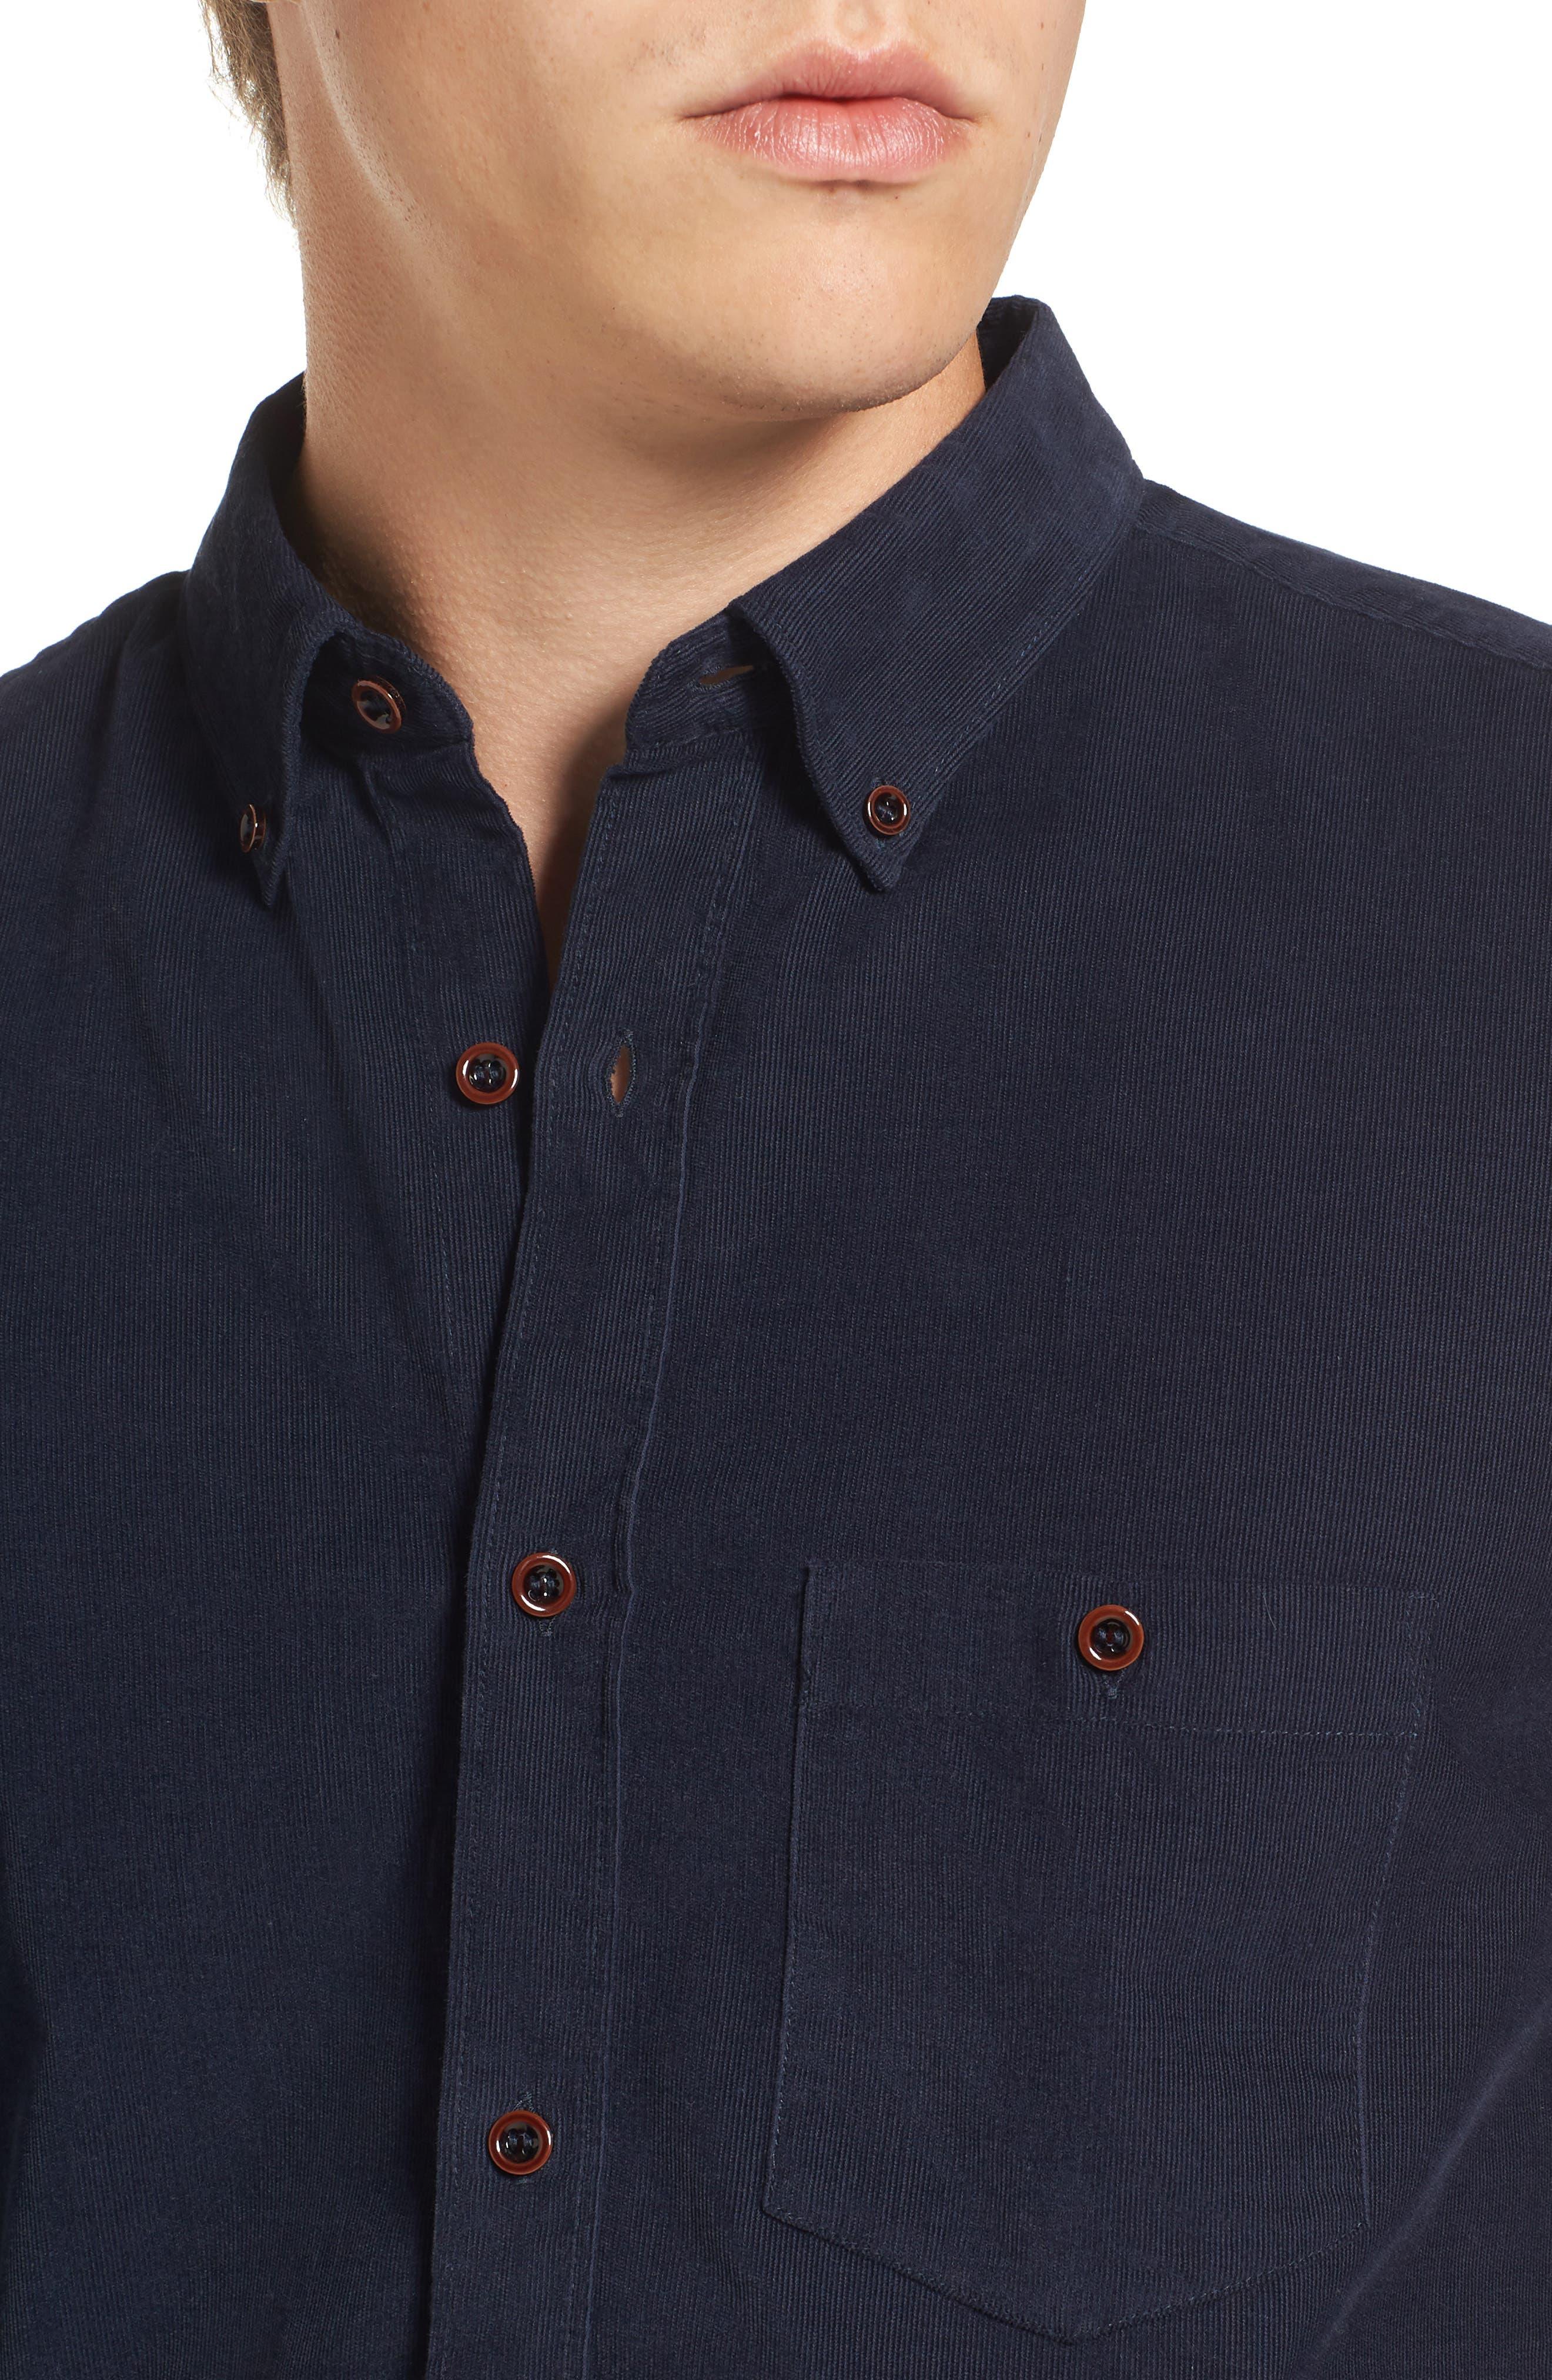 Corduroy Sport Shirt,                             Alternate thumbnail 4, color,                             406